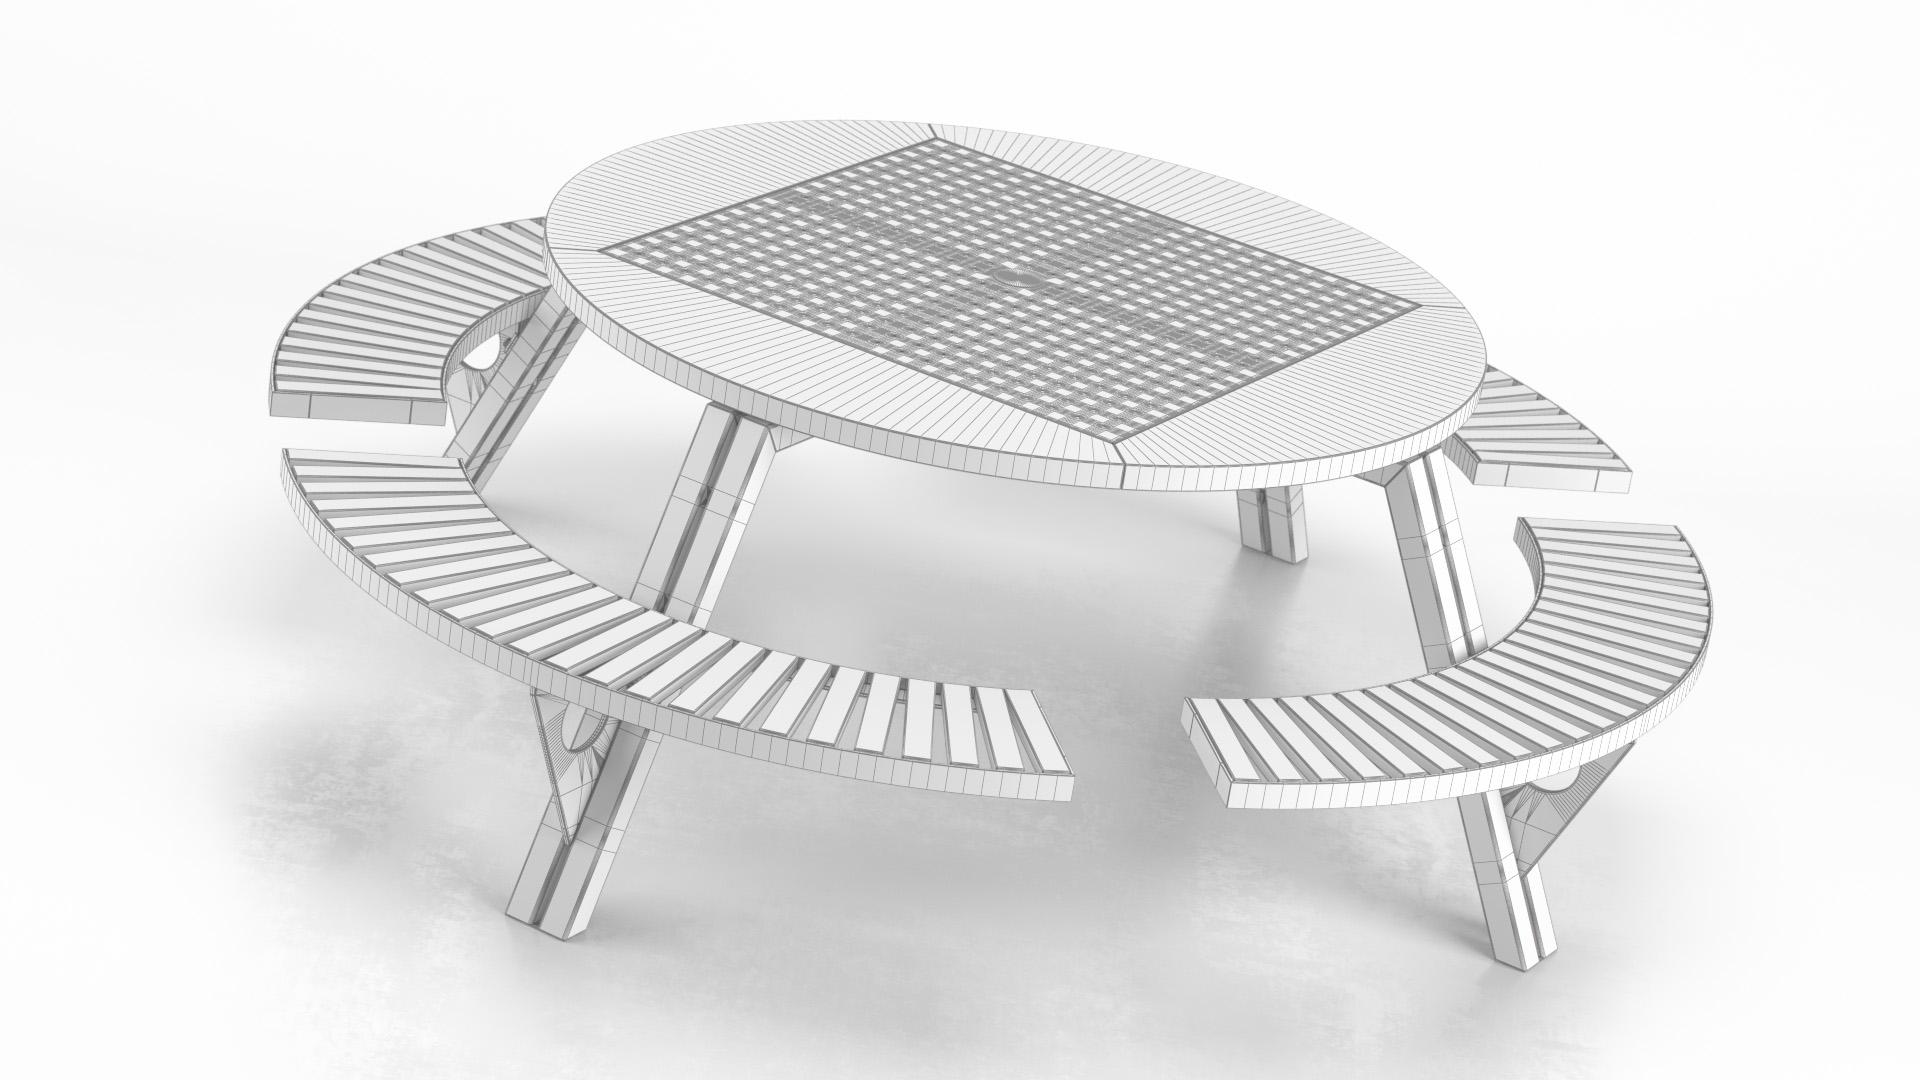 Gargantua_Table_Mode1_WhiteSet_01_wire_0003